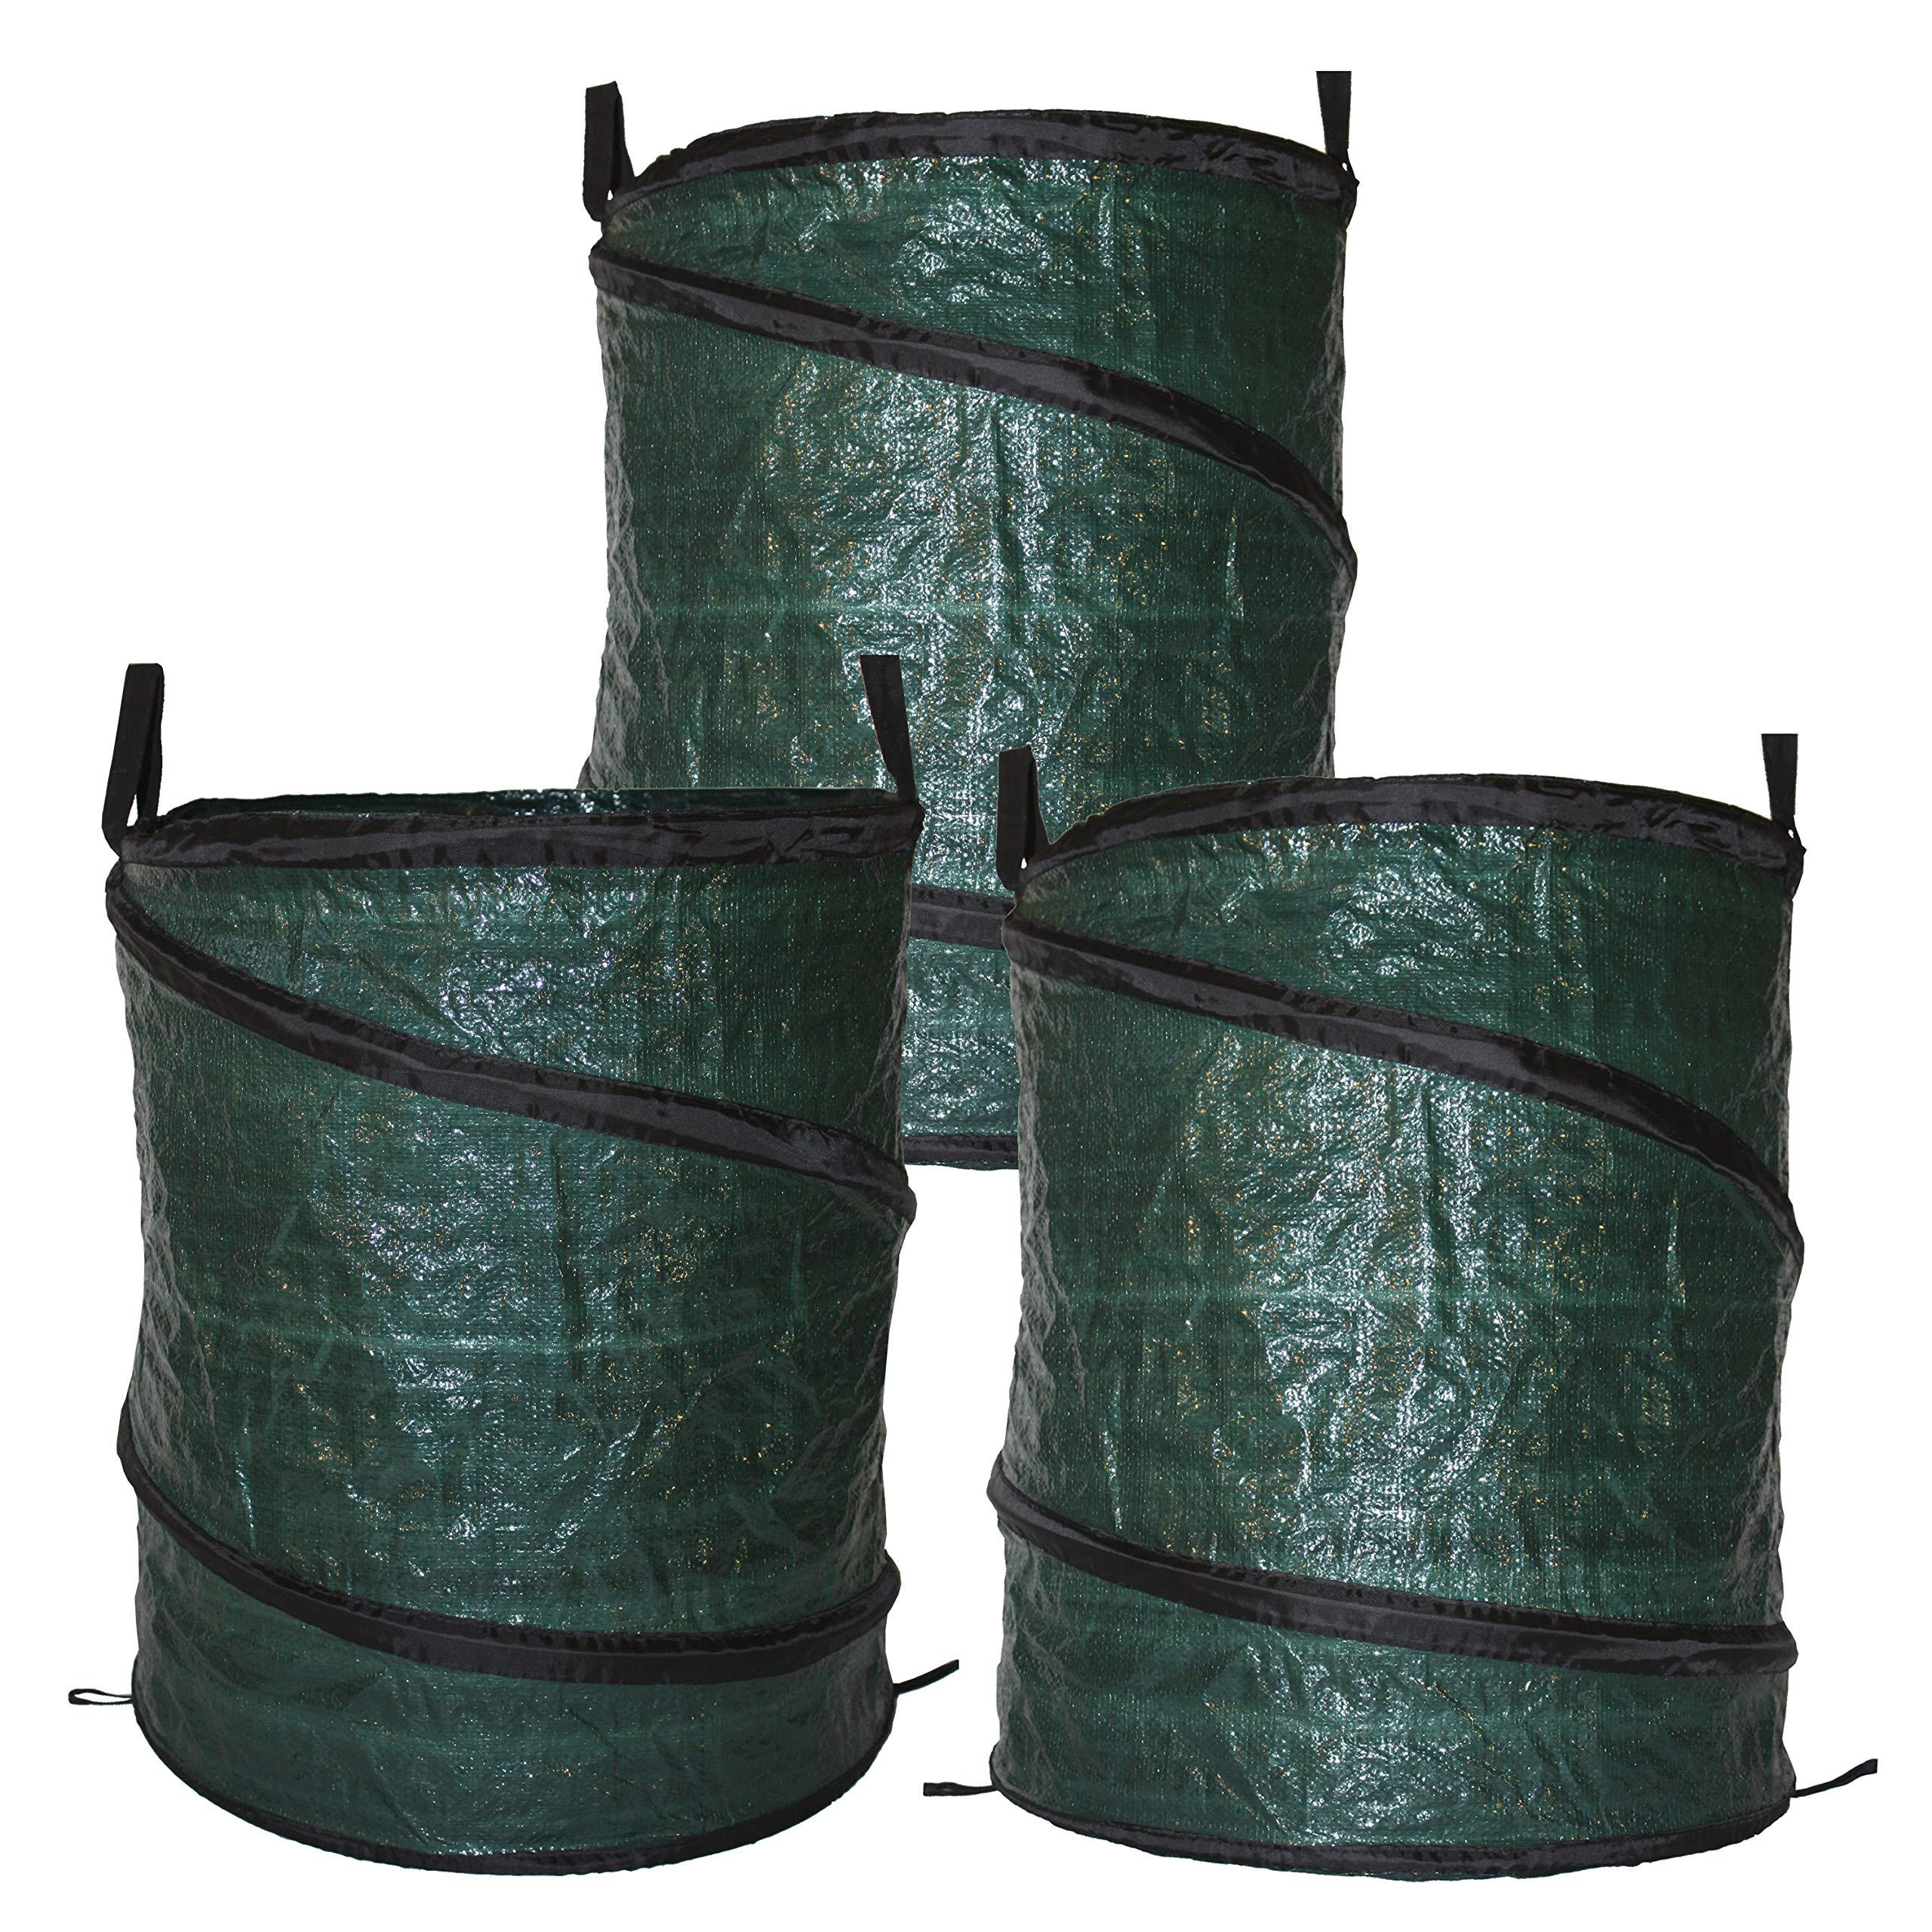 Bloem BAG3PK30G Collapsible Reusable 30 Gallon Pop Up Lawn Garden Leaf Bag 3-Pack, Green by Bloem